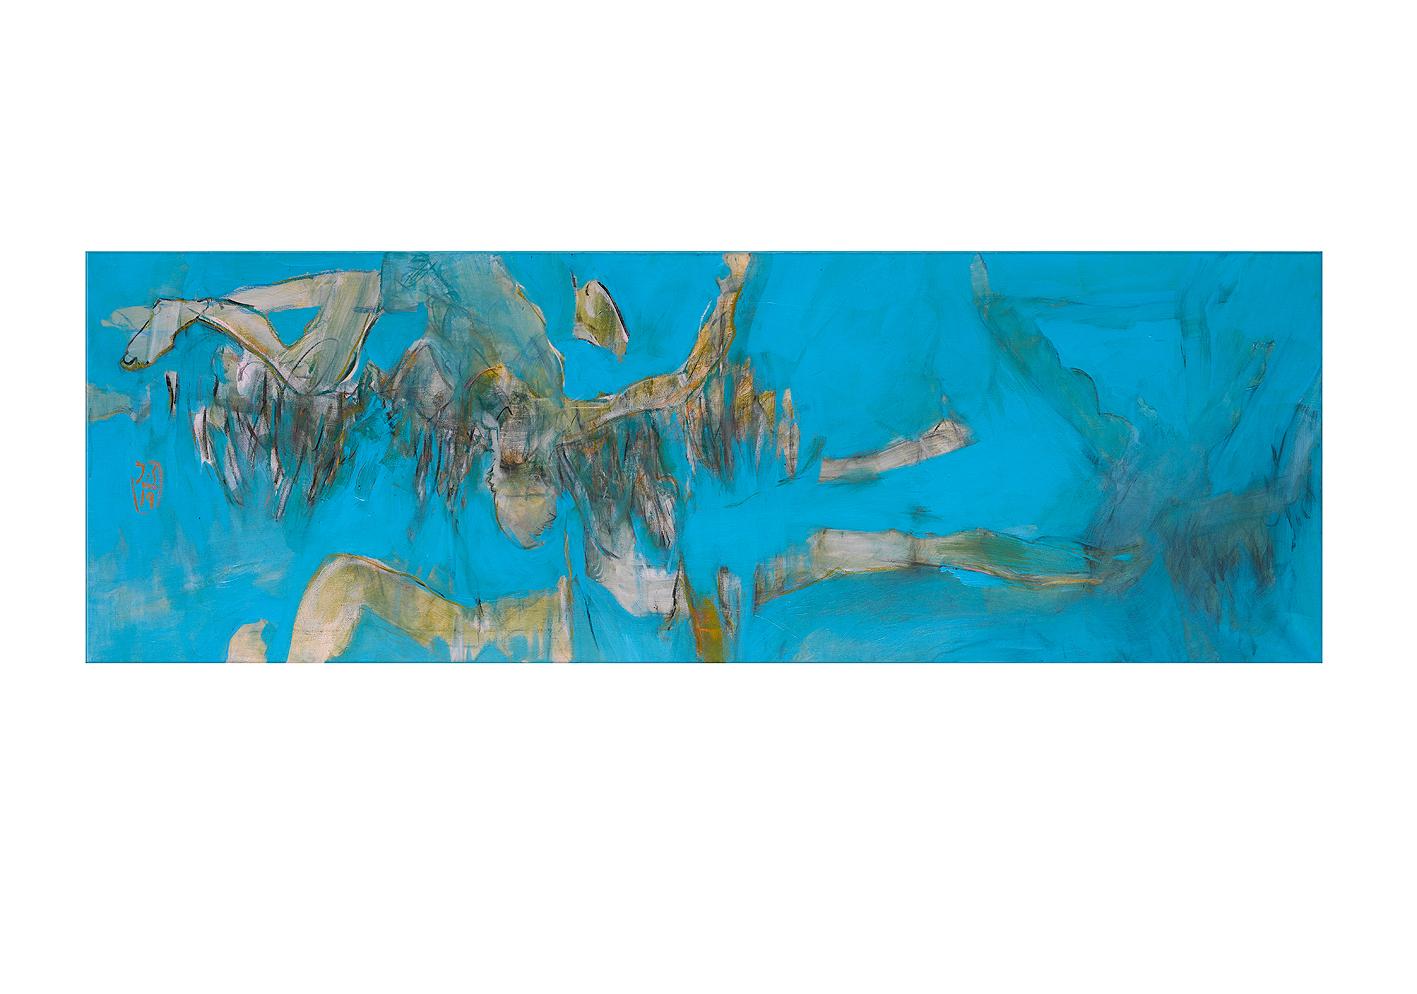 Wekarus_50x150_Acryl, Kohle & Pastell auf Lwd.